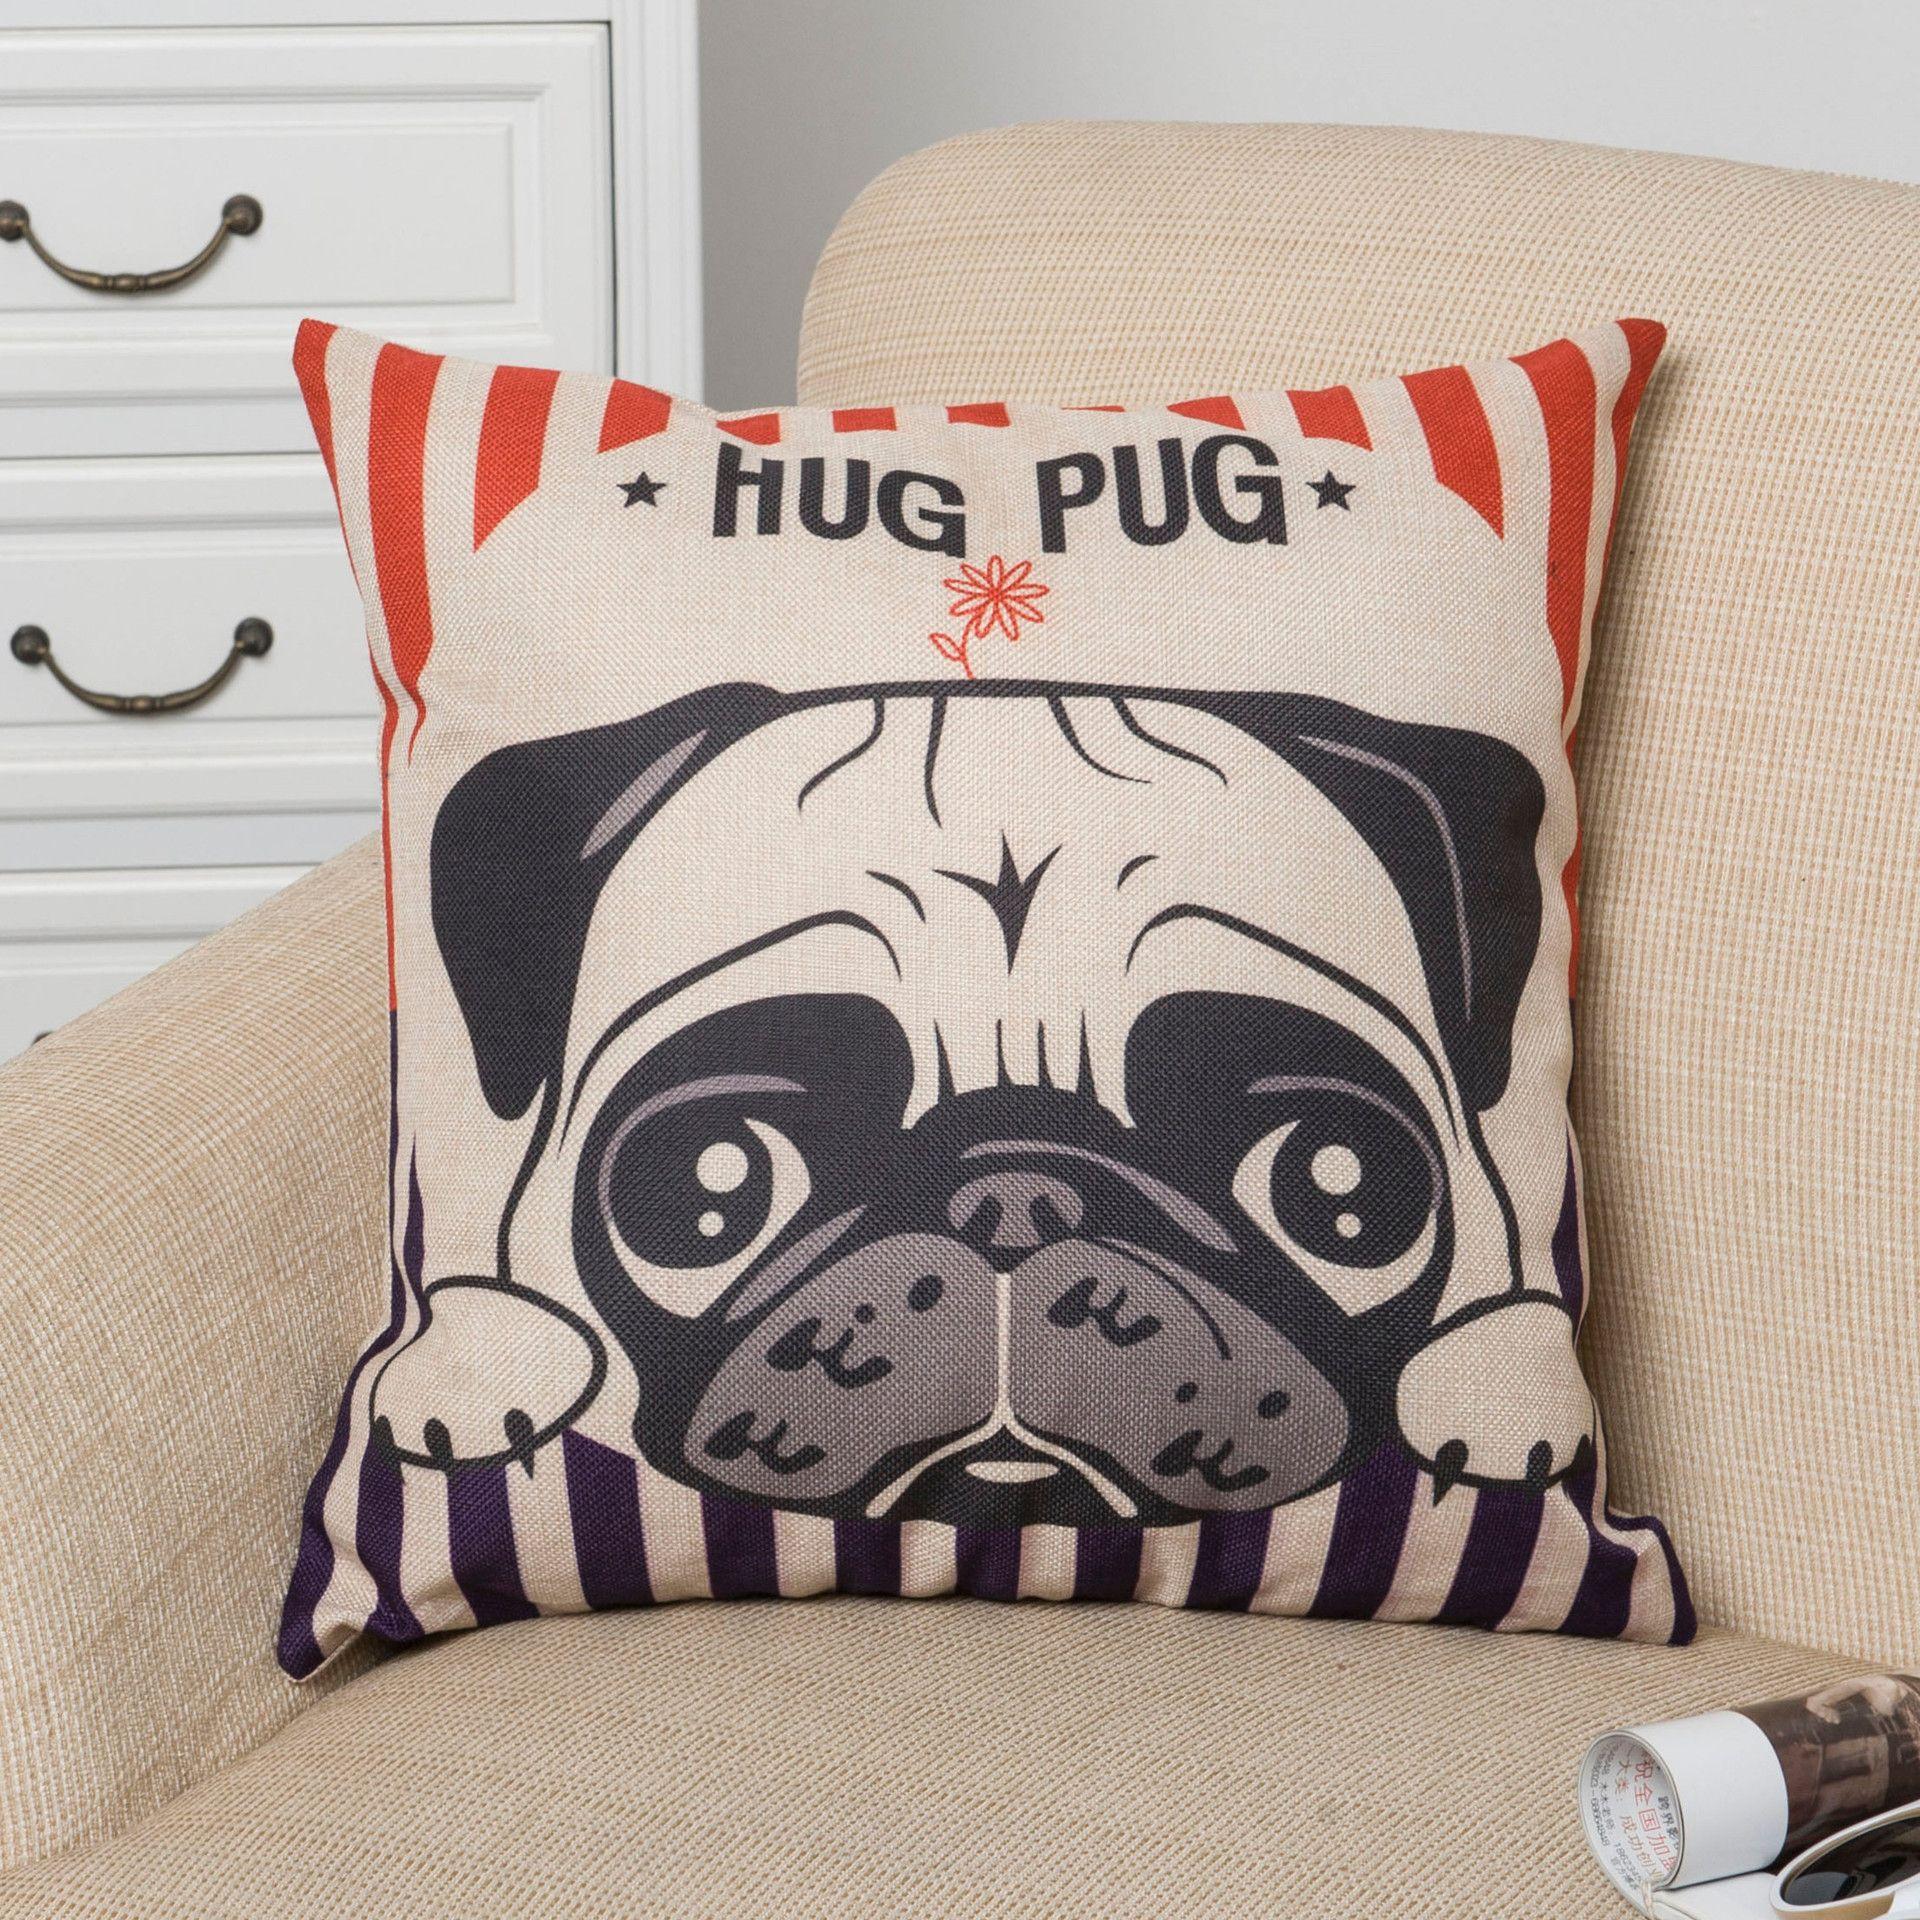 inspirational inspirational cool throw pillows   nordic style  - inspirational inspirational cool throw pillows   nordic style animalpillowcase painting french bulldog and pug